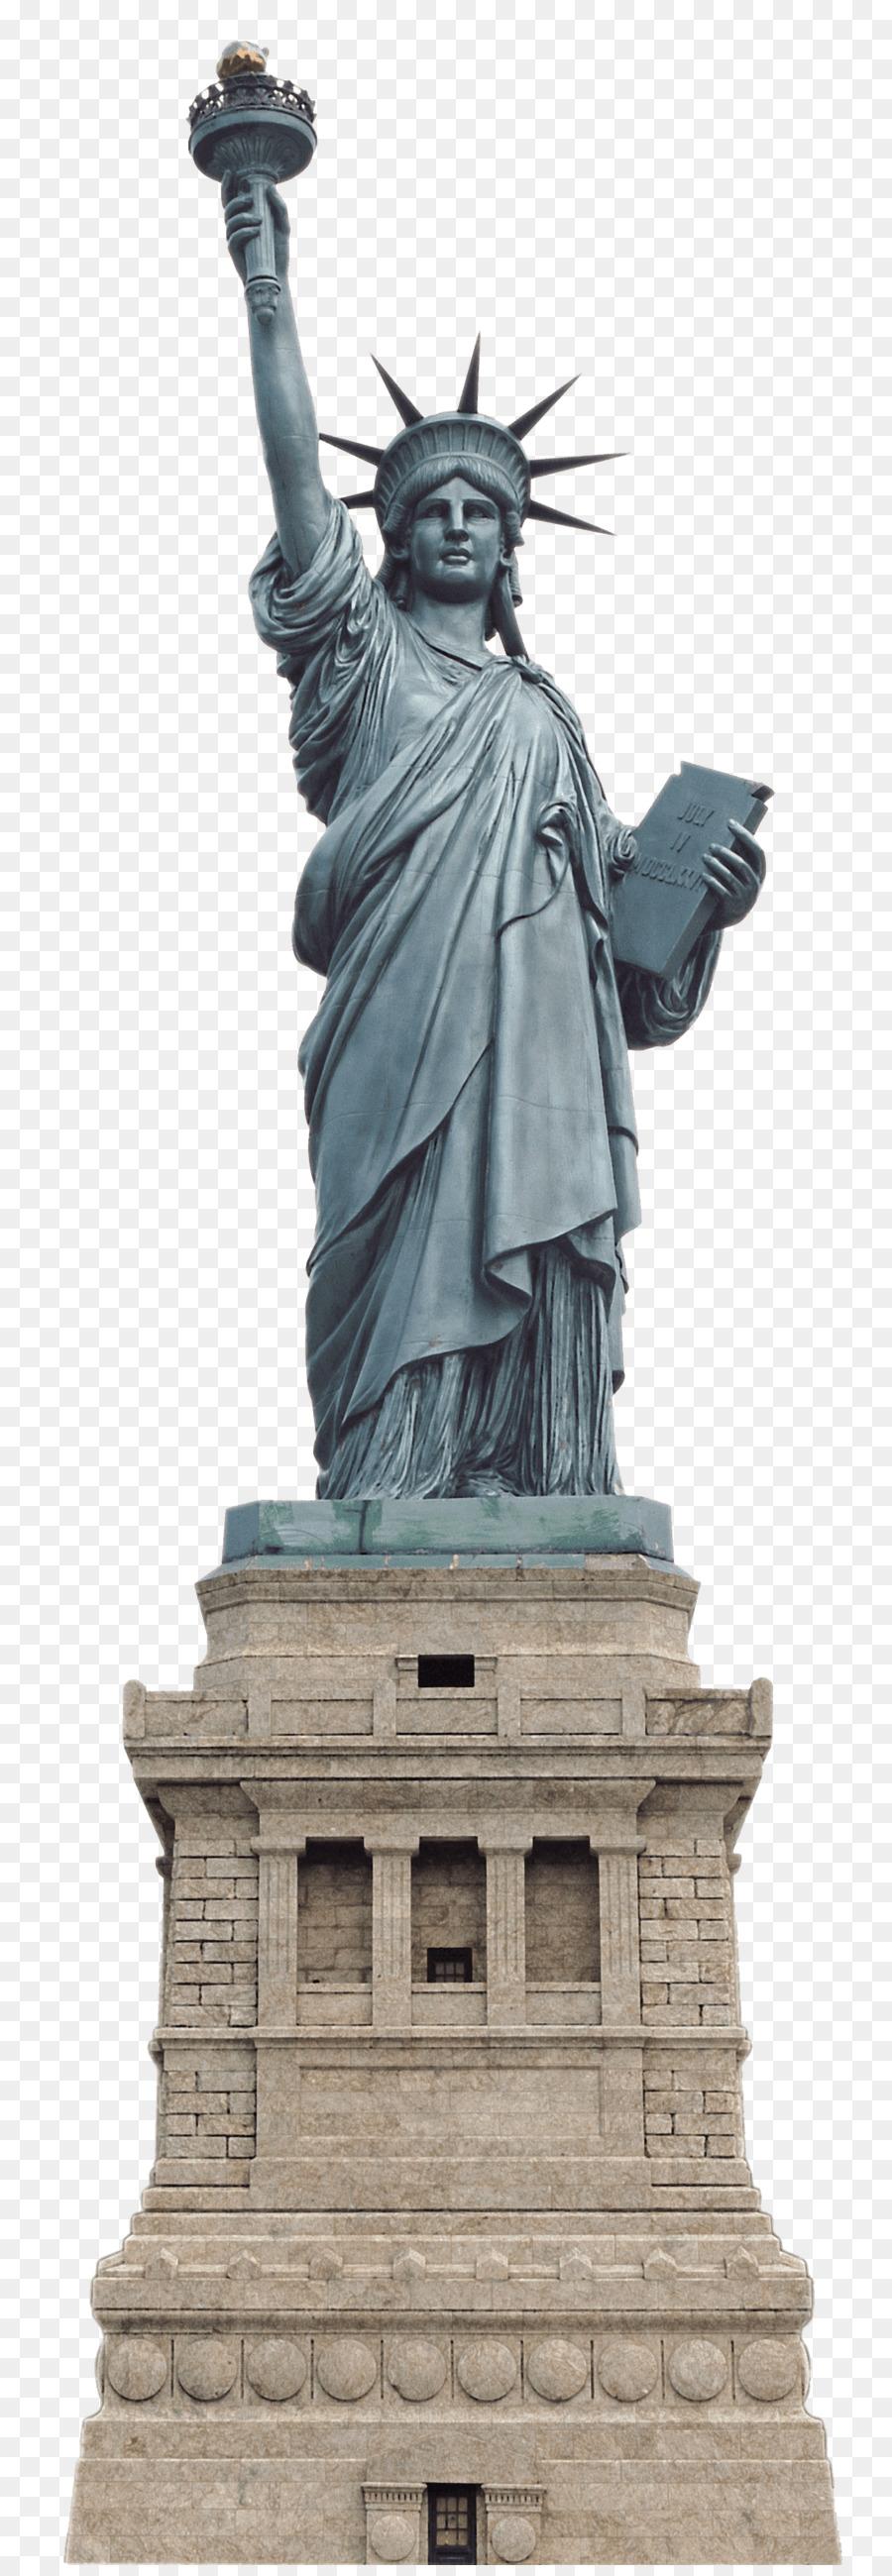 Descarga gratuita de Estatua De La Libertad, Estatua, Monumento imágenes PNG